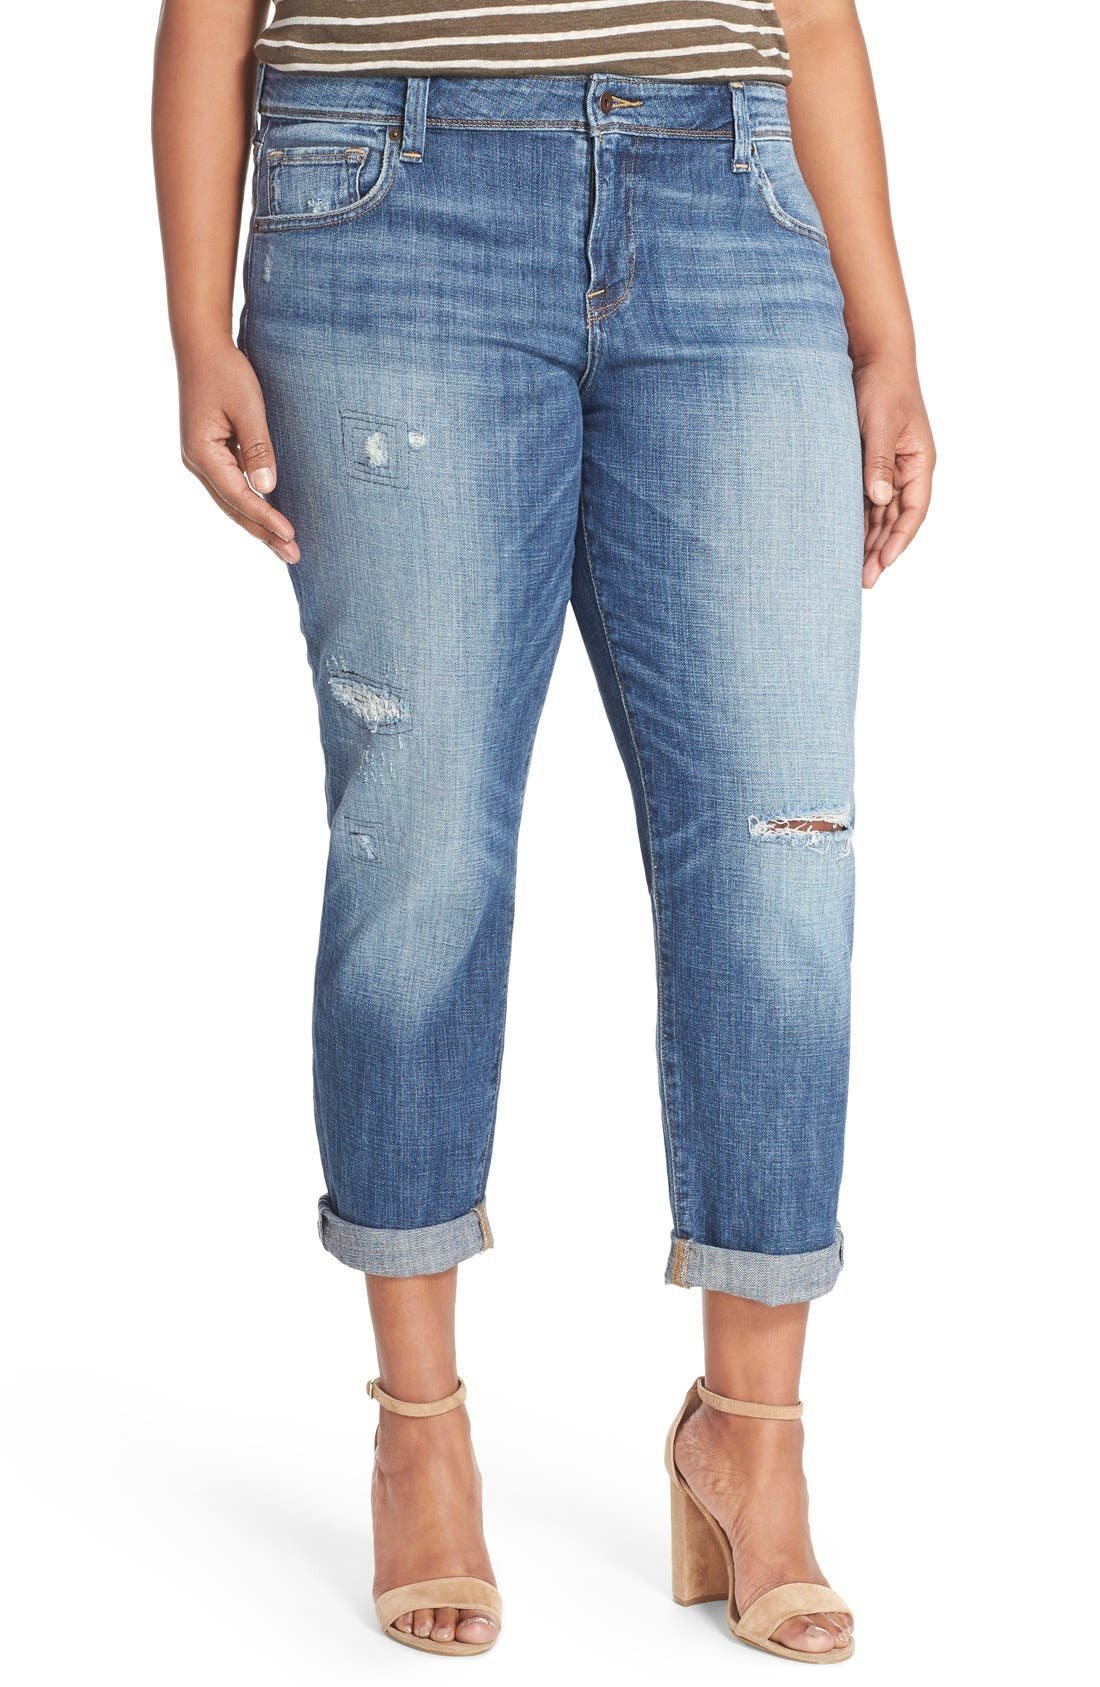 Main Image - Lucky Brand Reese Distressed Boyfriend Jeans (Northridge Park) (Plus Size)